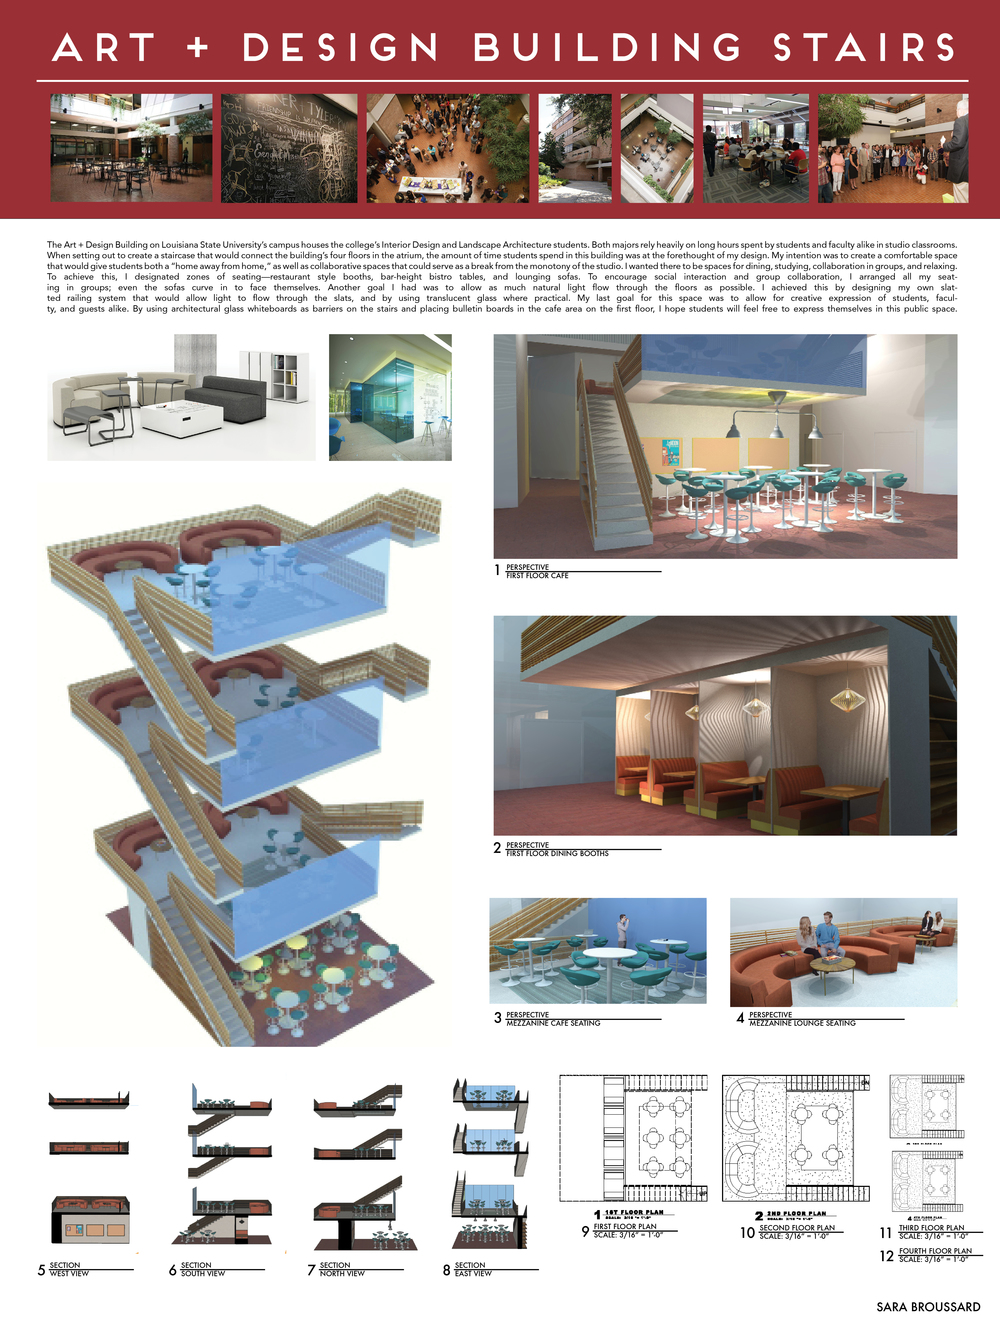 Atrium Stairs Board.jpg